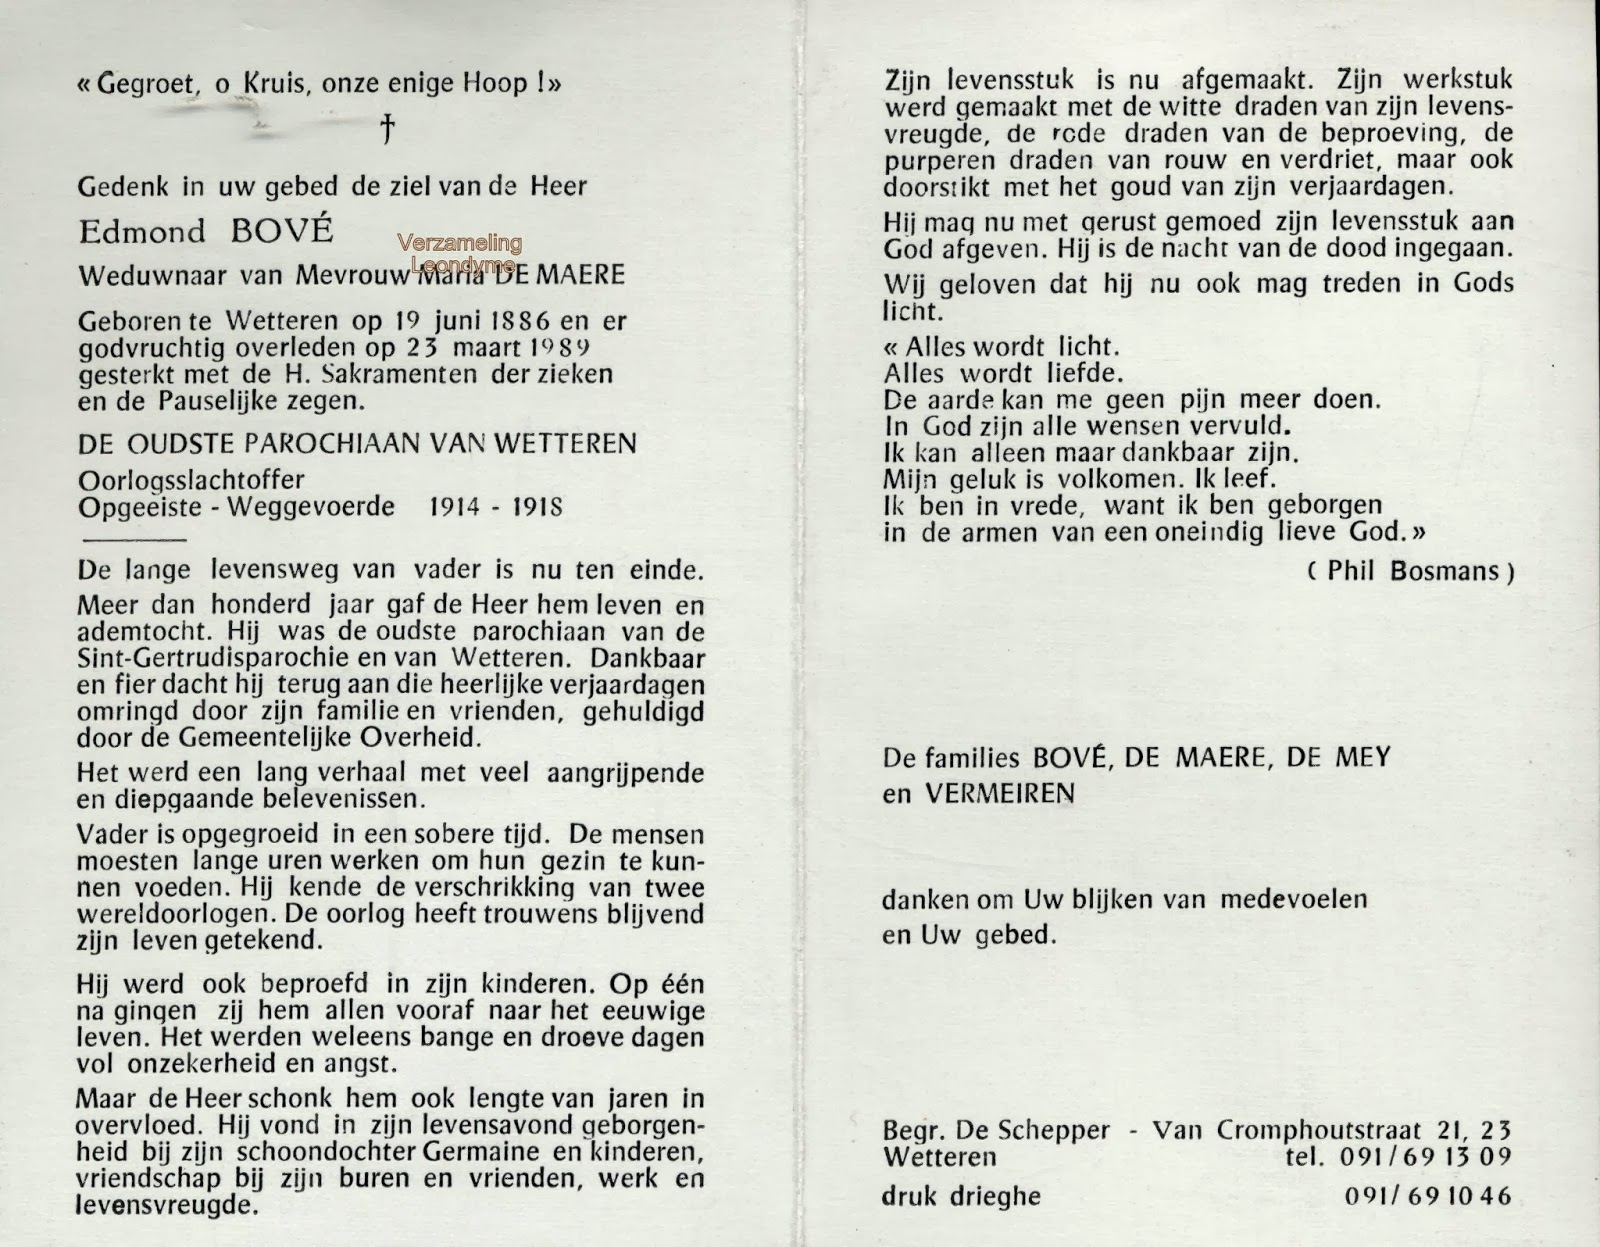 Bidprentje, Edmond Bové 1886-1989. Verzameling Leondyme